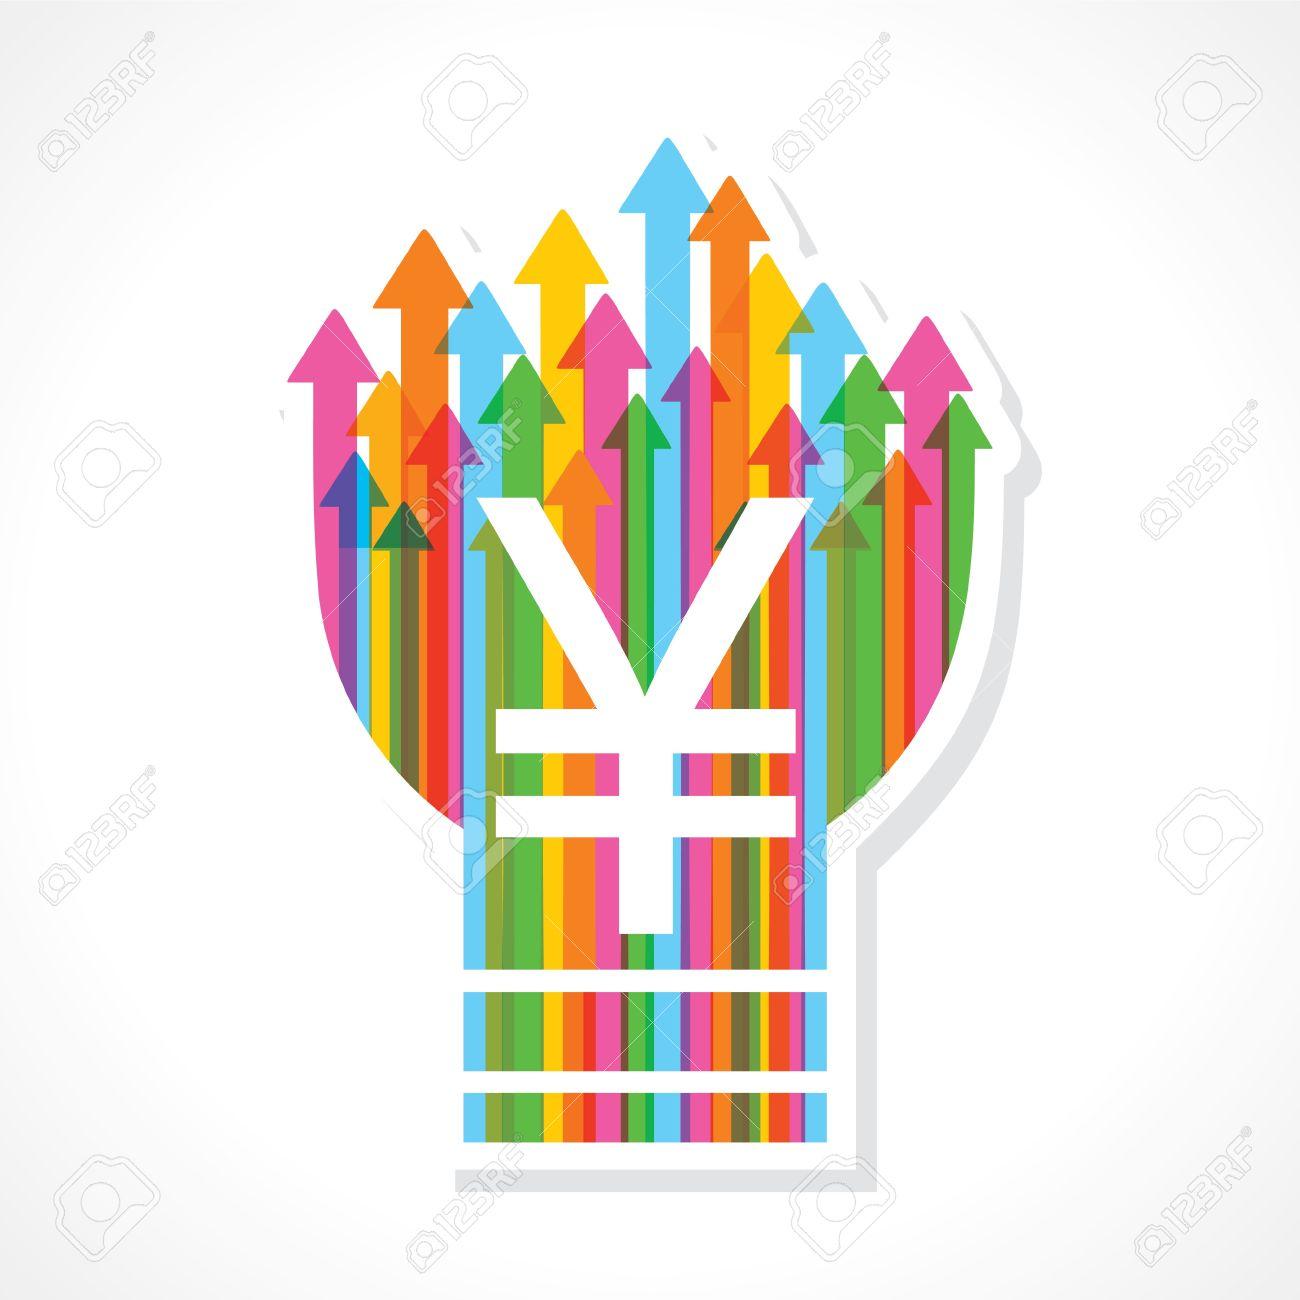 Yen symbol on colorful arrow bulb stock vector Stock Vector - 19080378